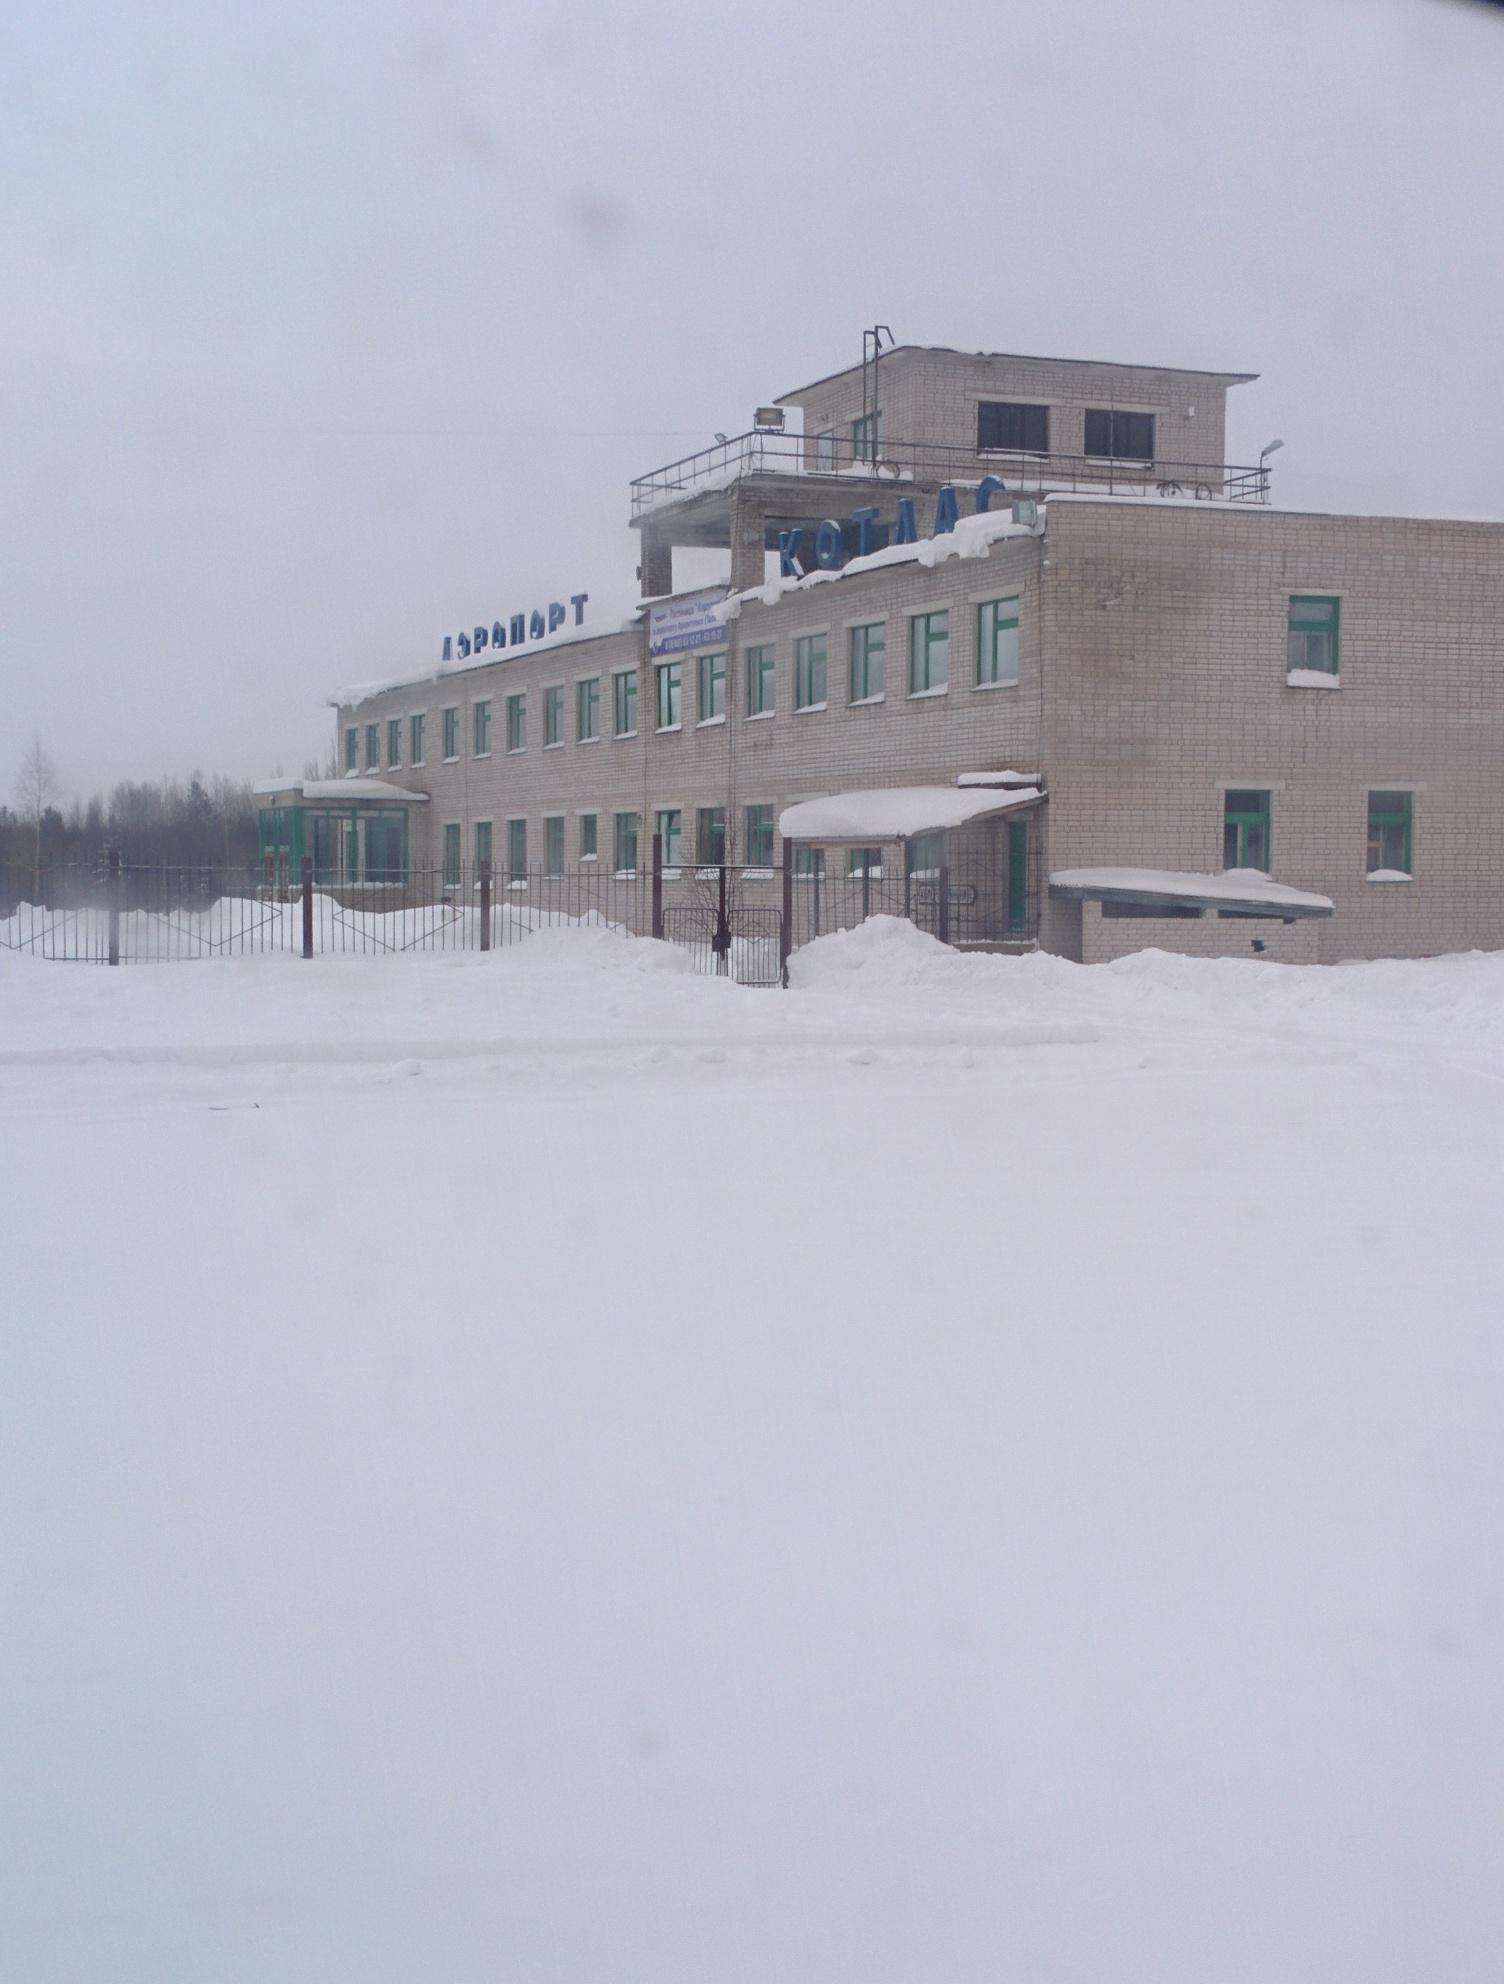 Аэровокзал аэропорта Котлас